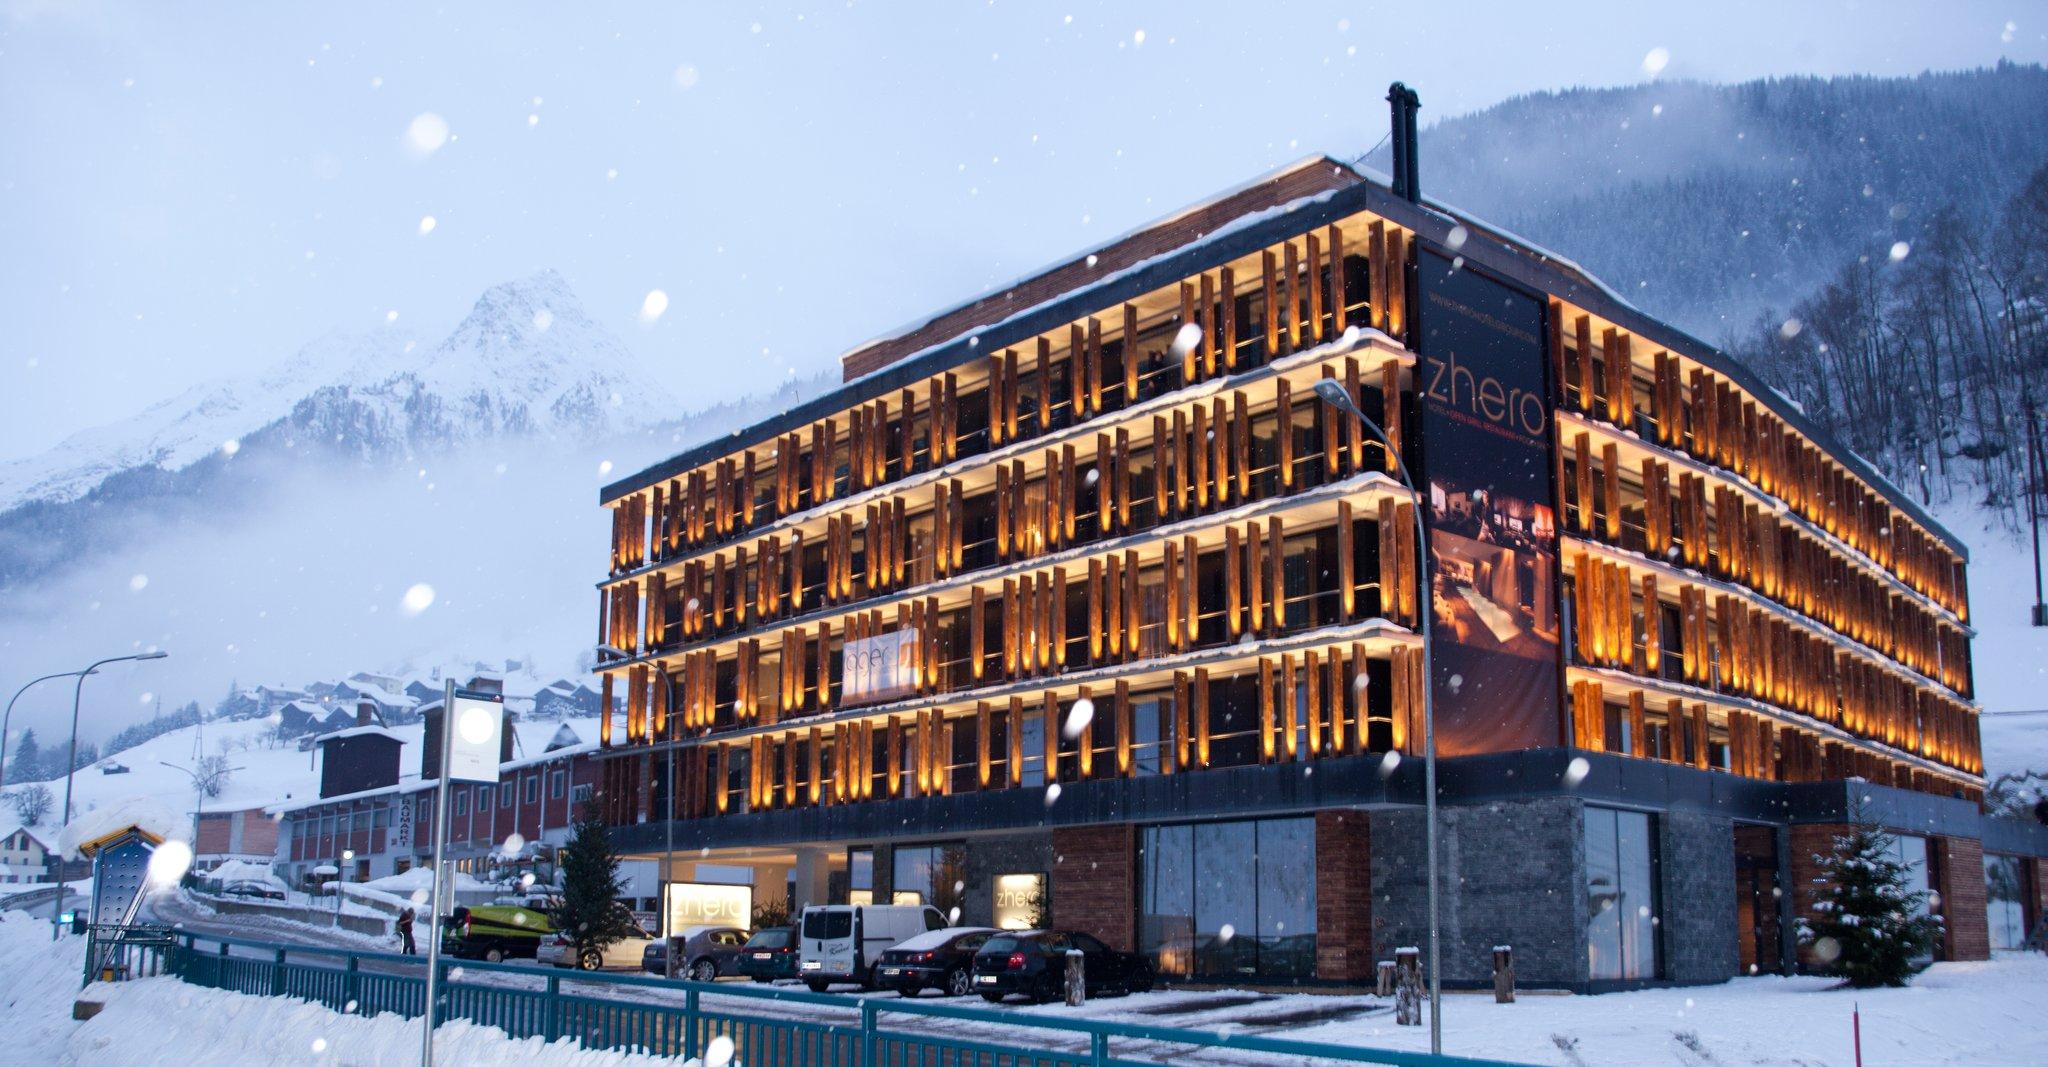 Hotel Zhero Ischgl, a Design Hotel